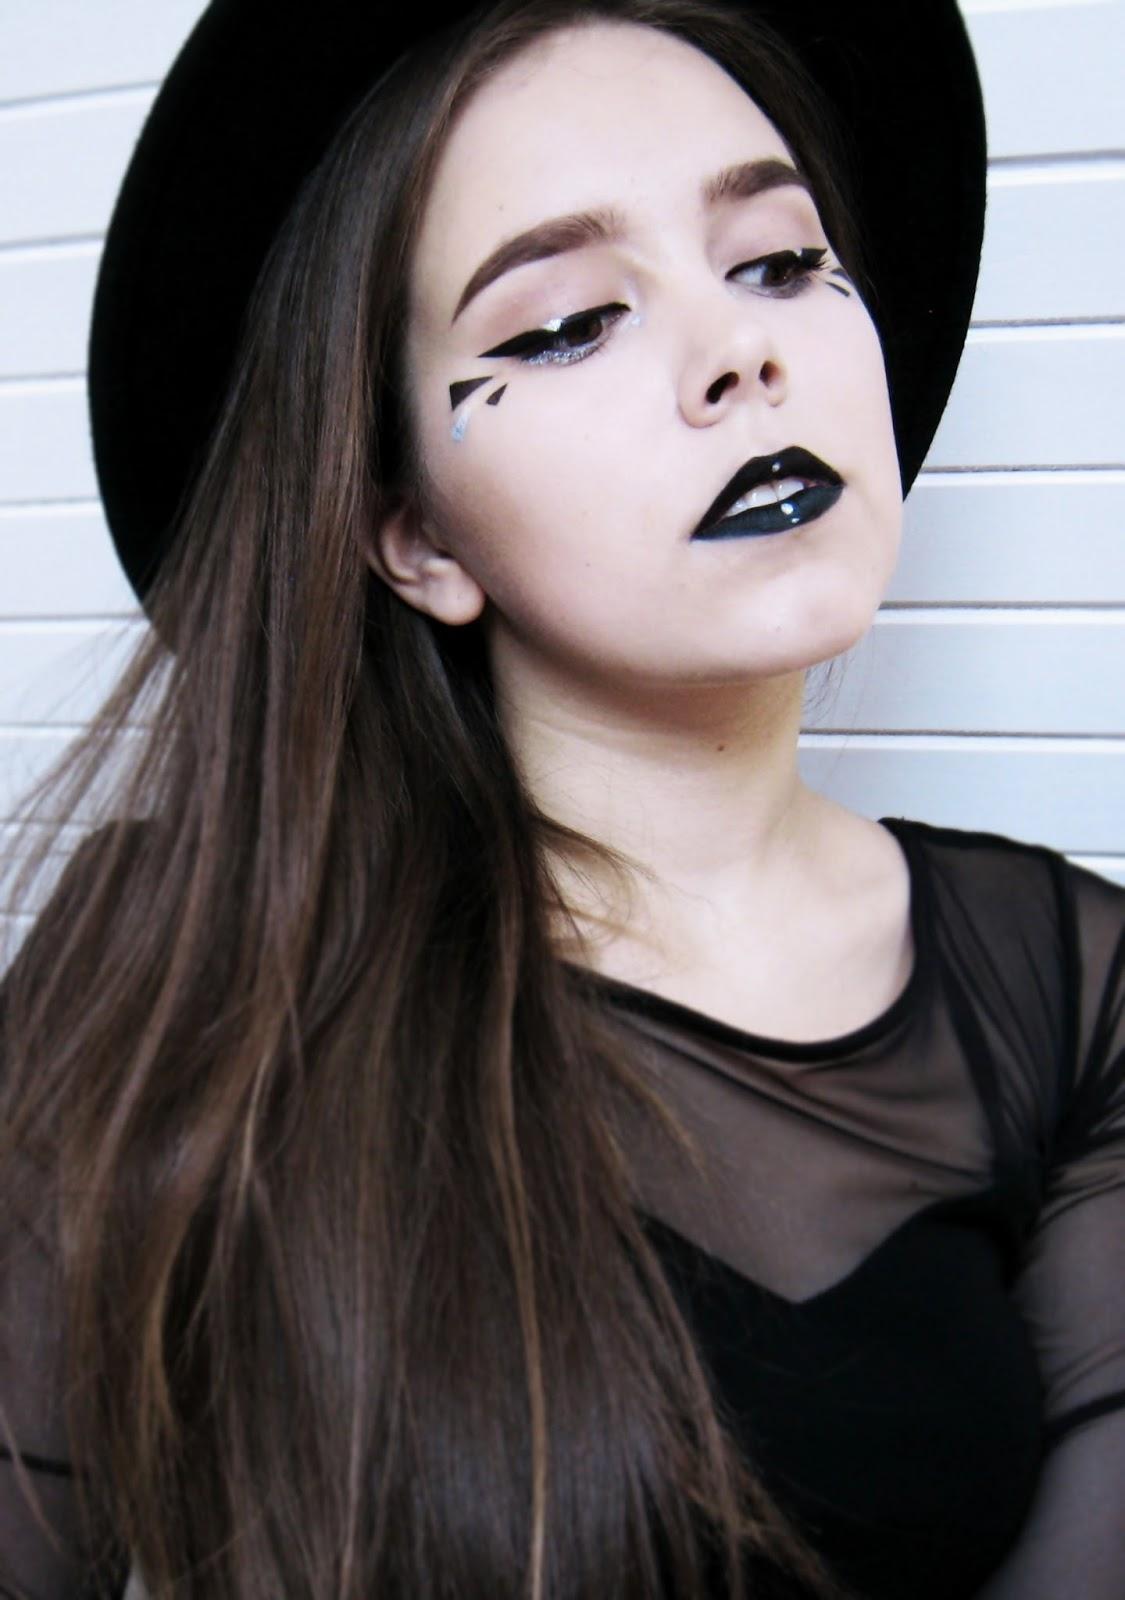 http://colorfulmadworld.blogspot.com/2014/09/graphic-make-up.html